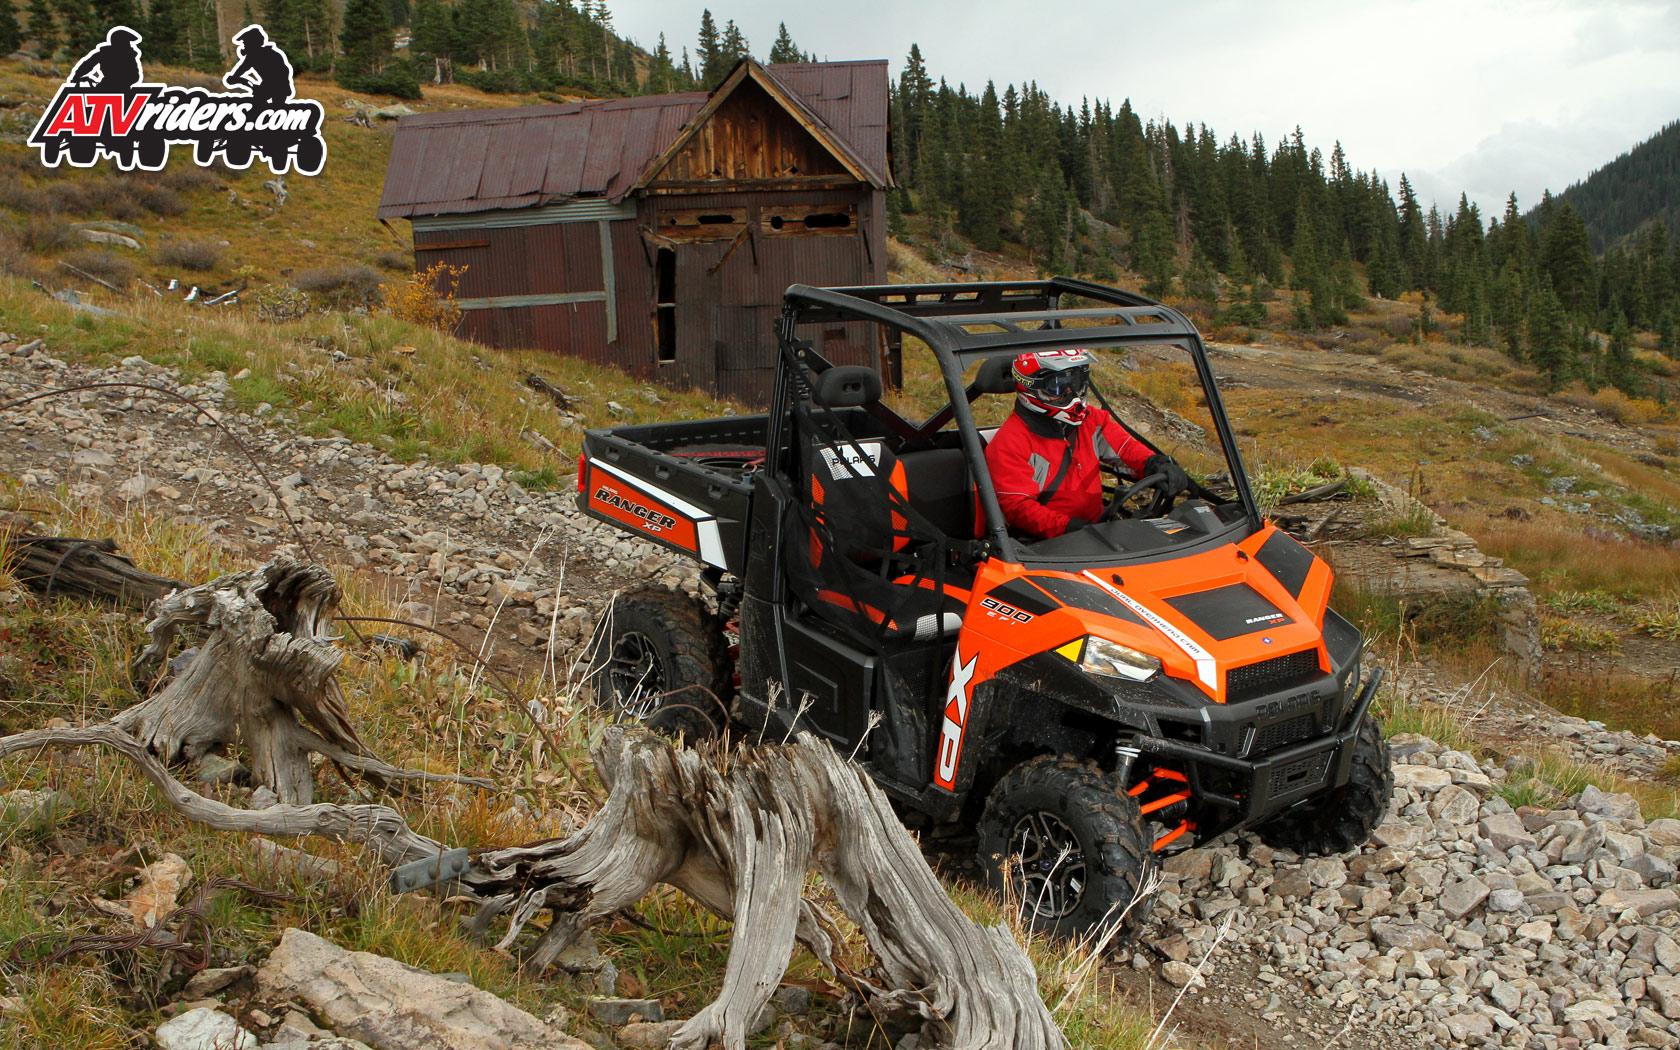 Ouray Telluride Colorado   ATVriderscom Wednesday Wallpapers 1680x1050